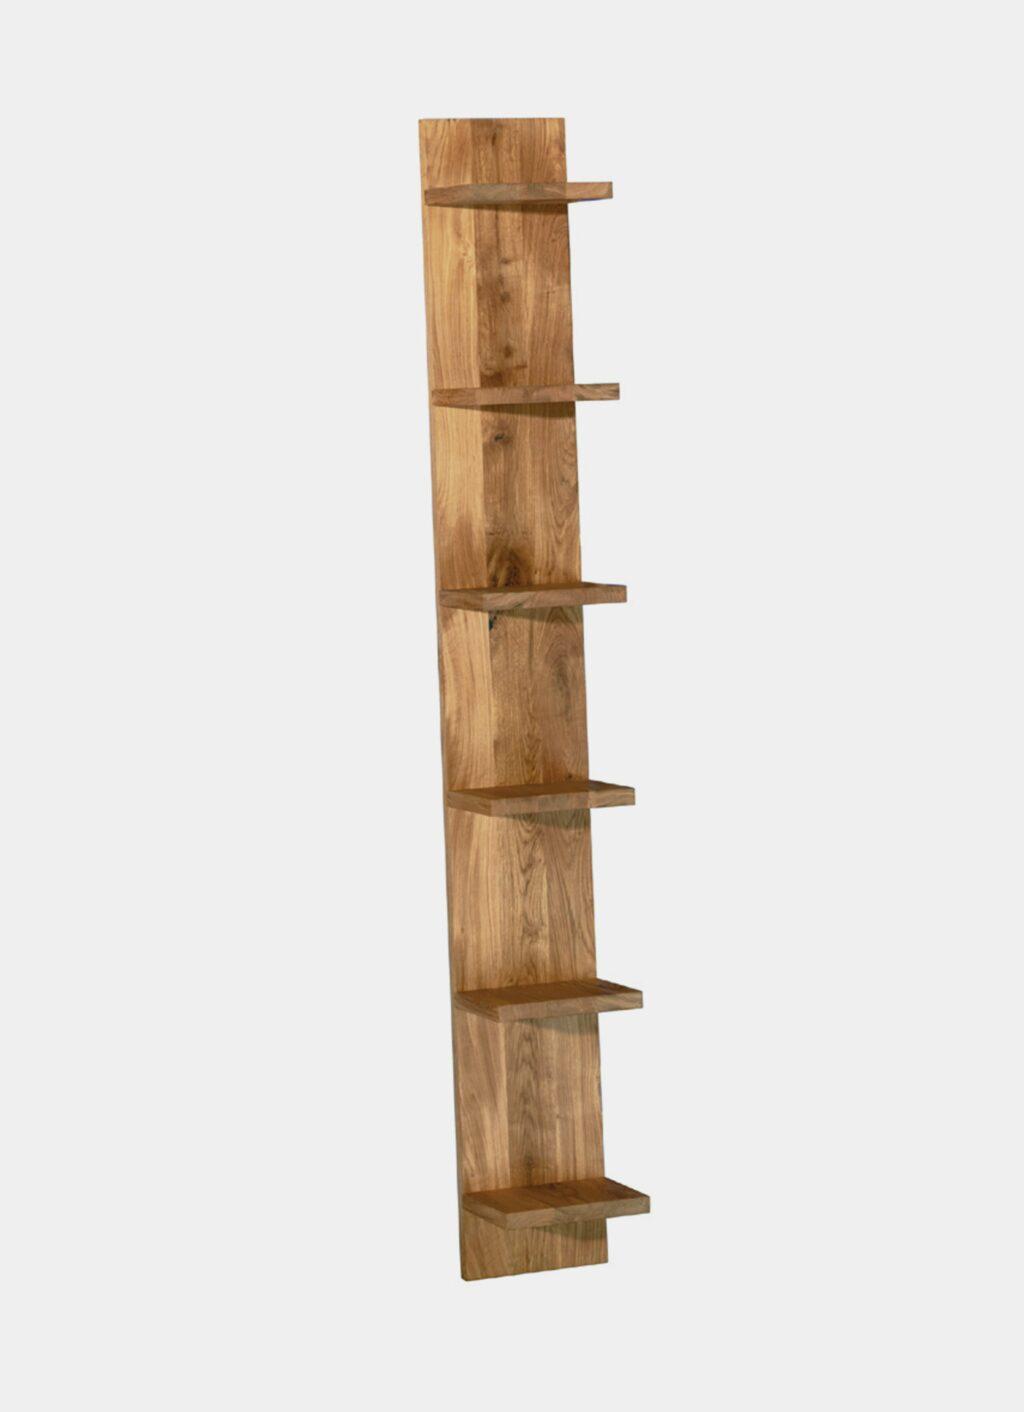 e15 - MATE - Solid Oak Shelf by Florian Asche